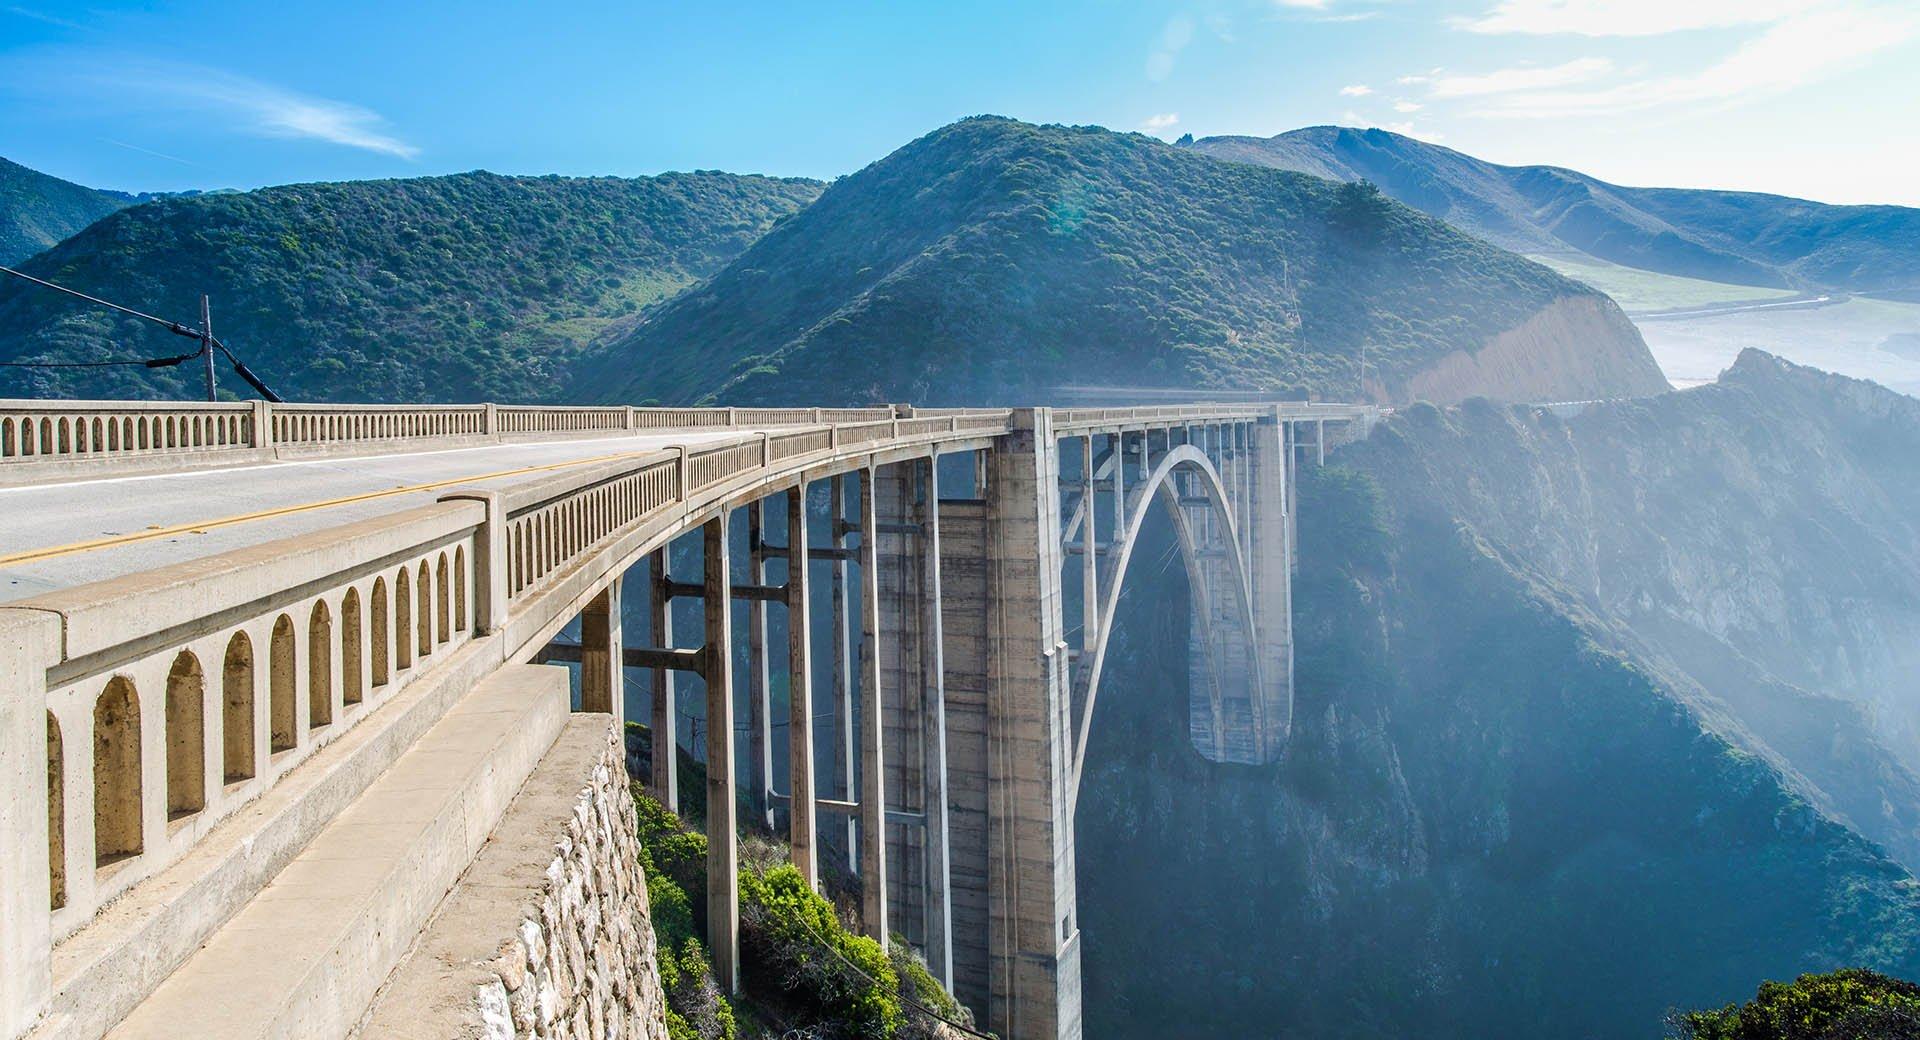 Syandus bridge